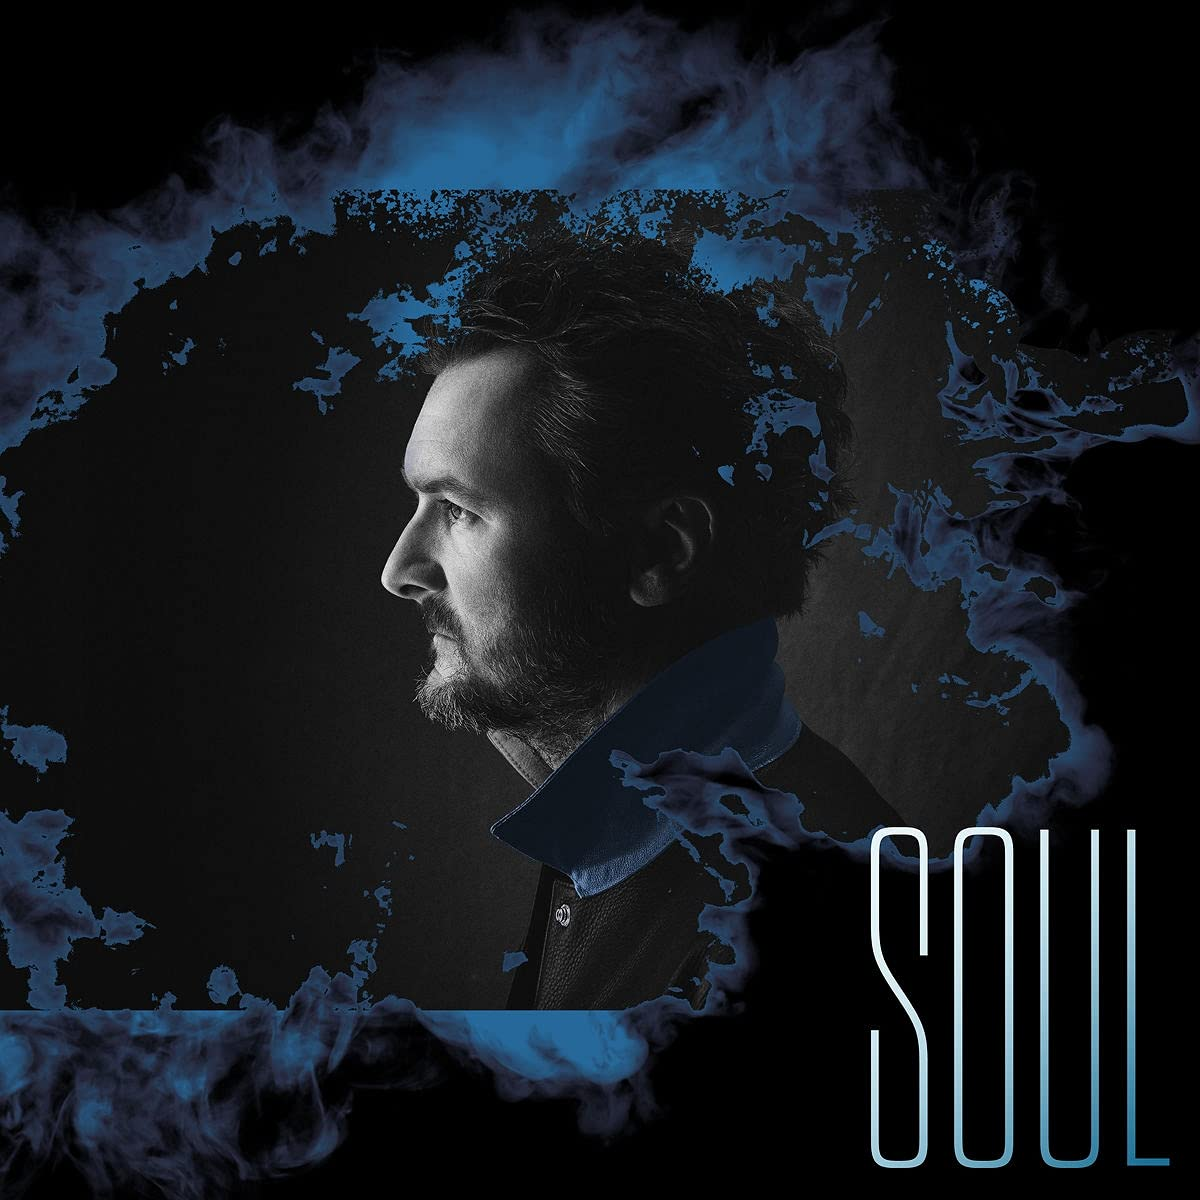 Eric Church - Soul - Amazon.com Music